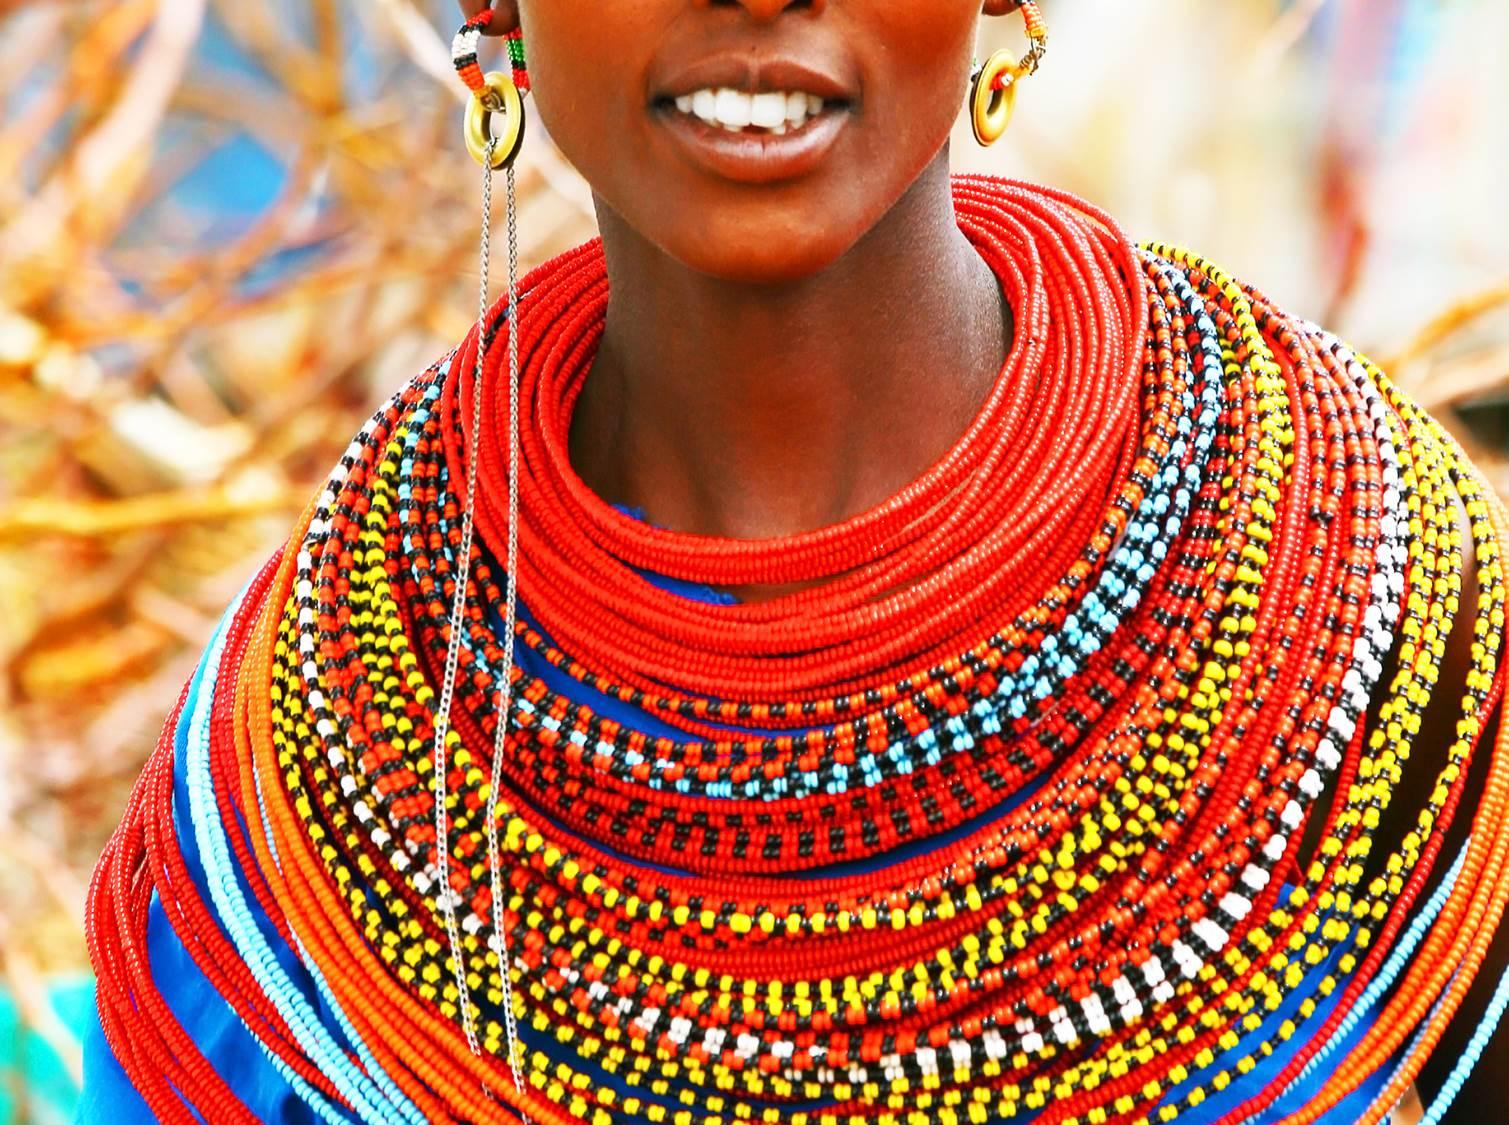 http://www.bellezapura.com/wp-content/uploads/2013/03/africa-colours.jpg